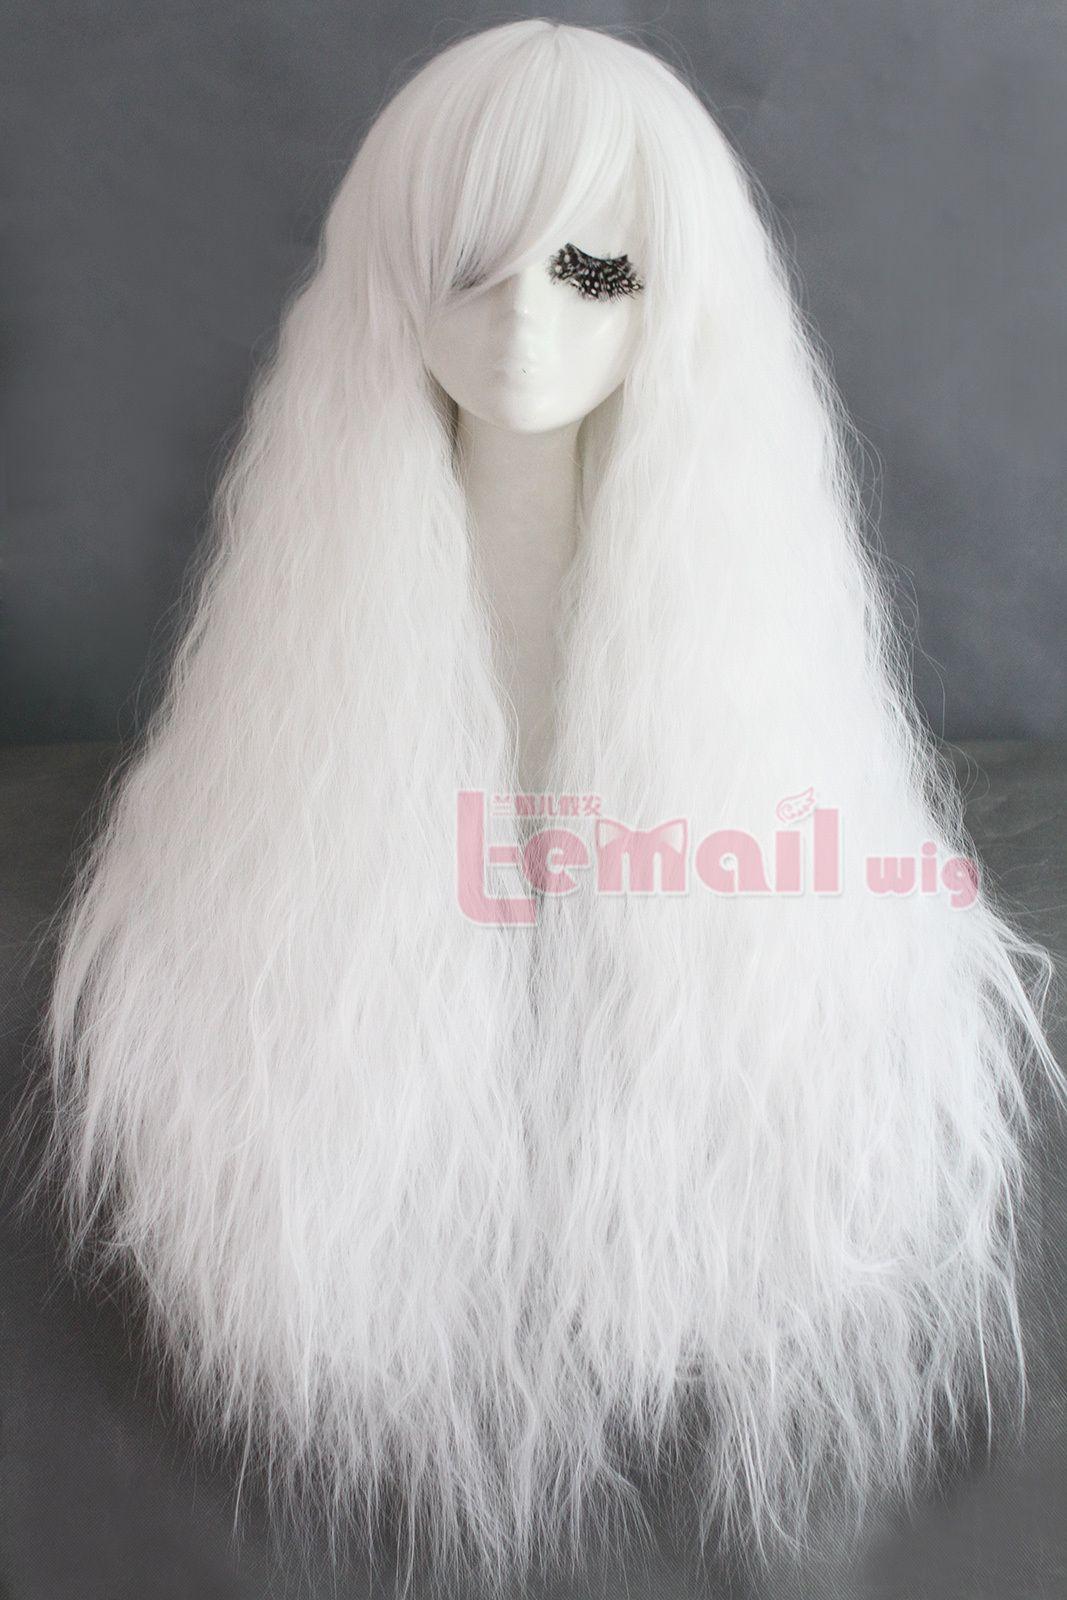 80cm Long Rhapsody White Curly Wave Cosplay Hair Wig Zy61 Cosplay Hair Wig Hairstyles Cosplay Wigs